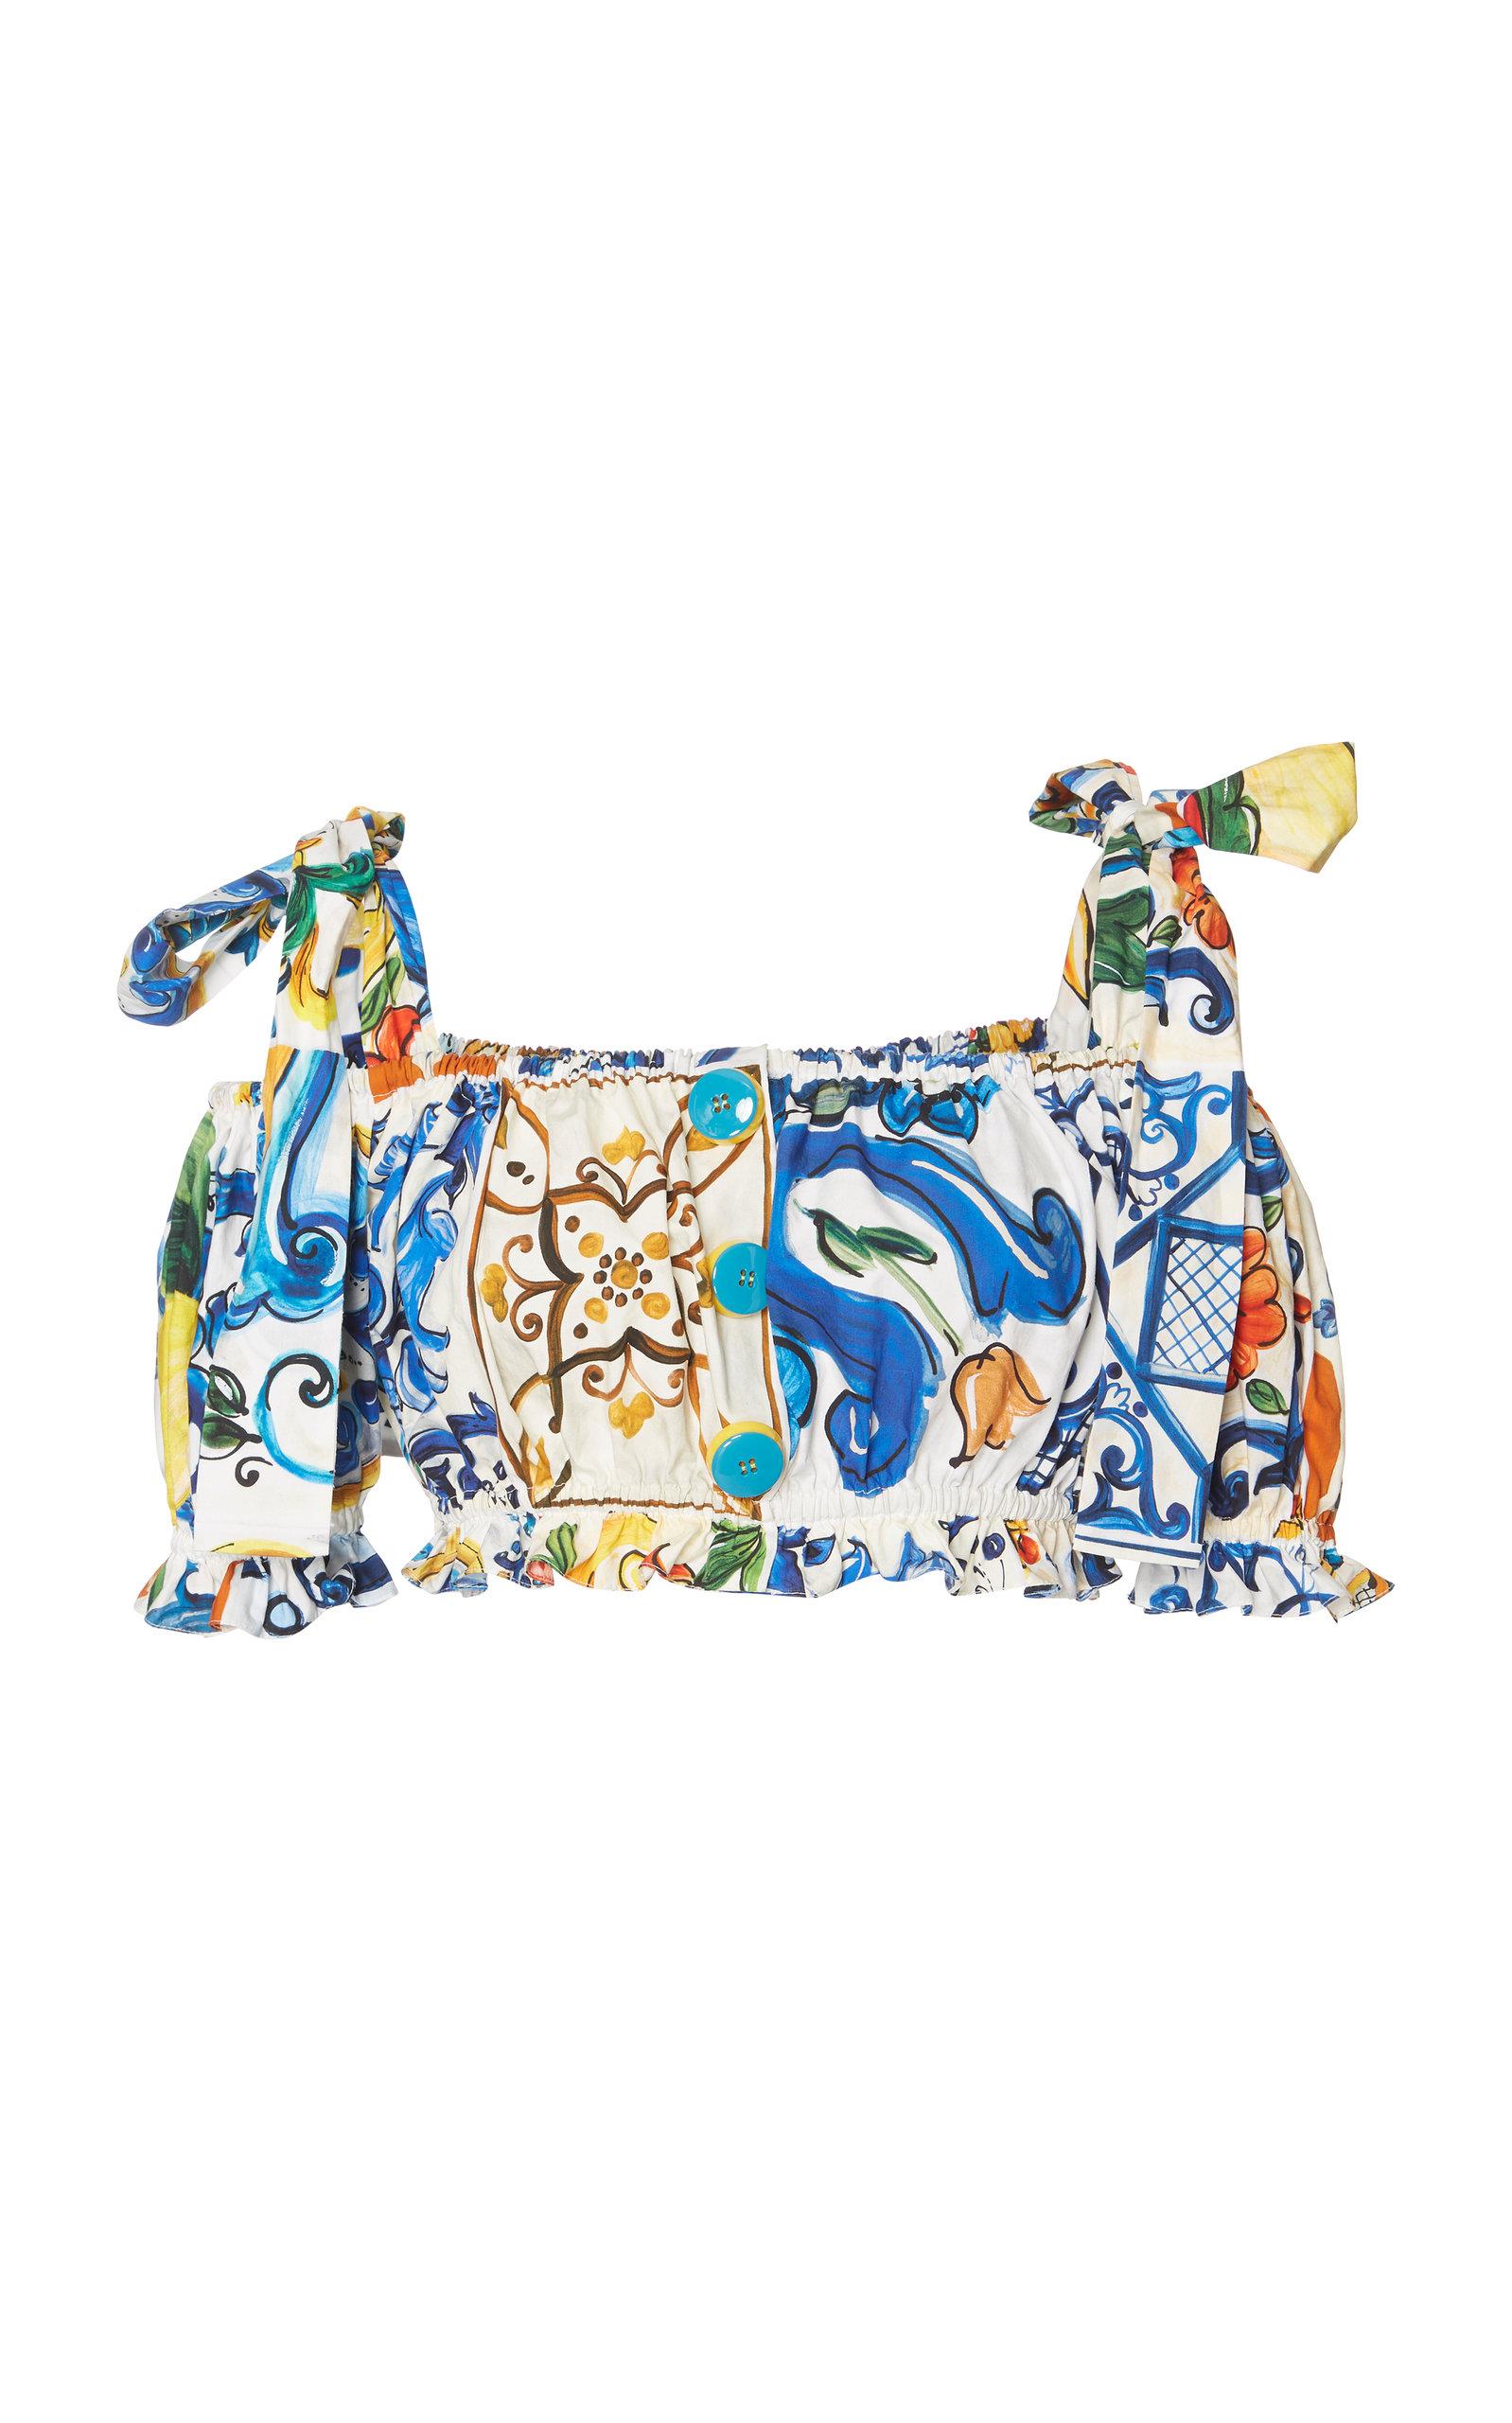 9bfabb51 Maiolica-Print Cropped Top by Dolce & Gabbana | Moda Operandi